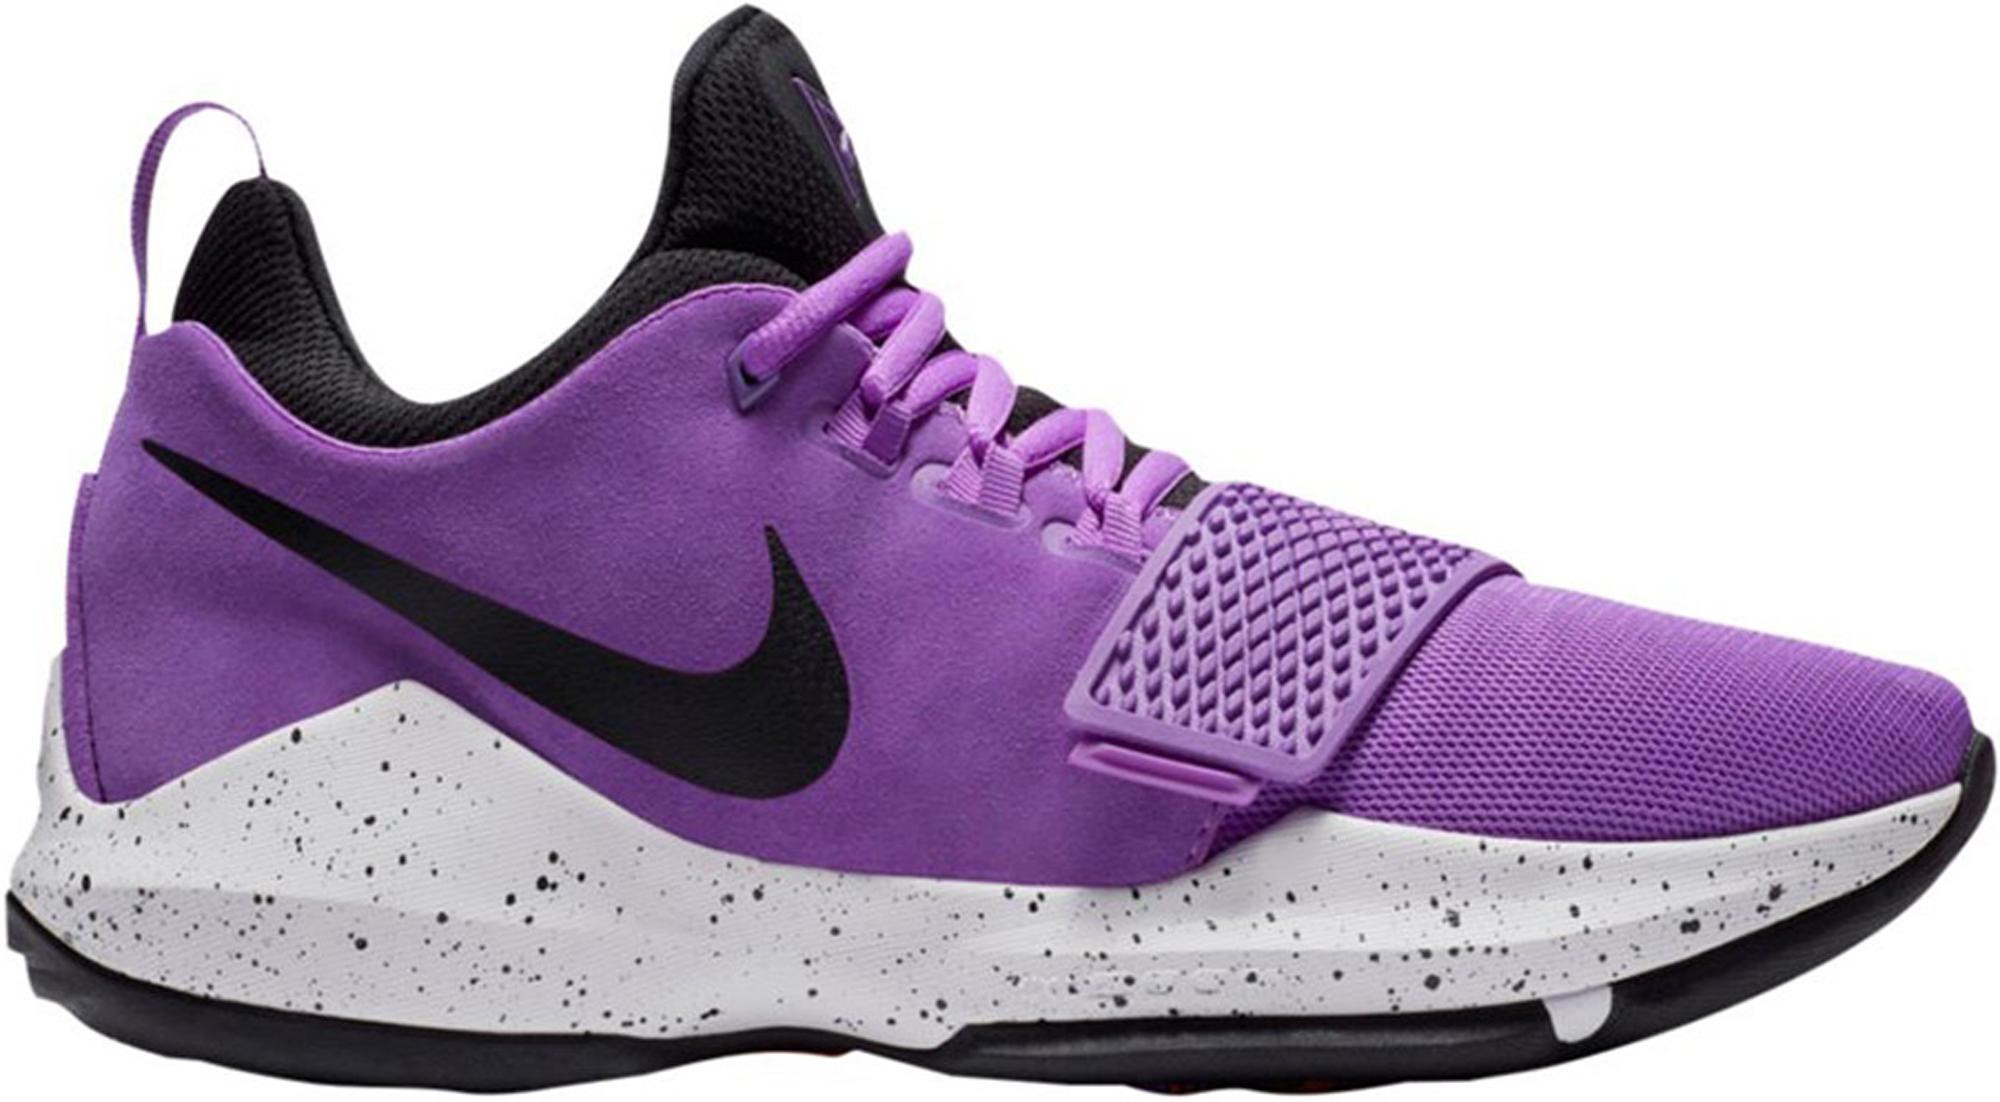 Nike PG 1 Bright Violet